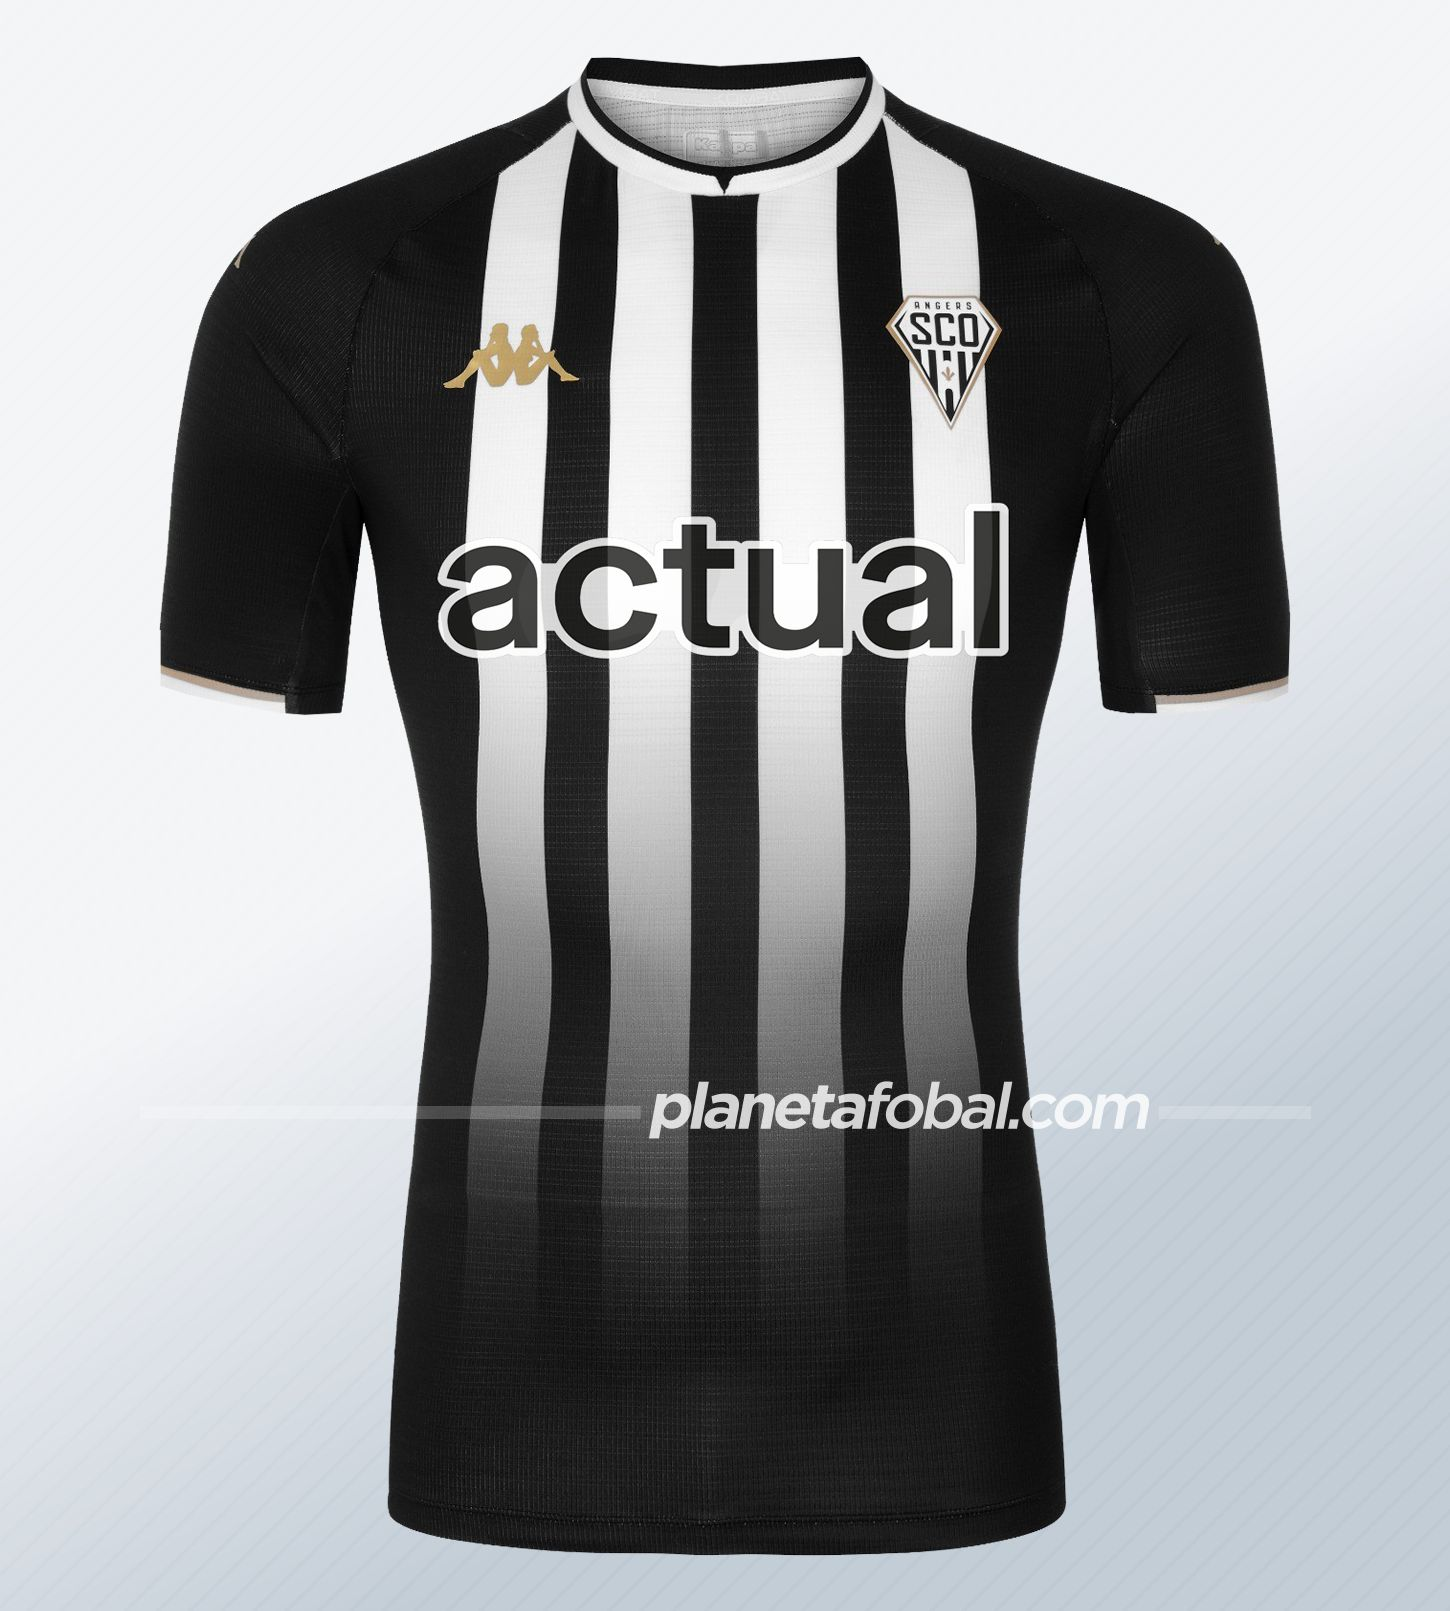 Camiseta titular Kappa del Angers SCO 2021/22